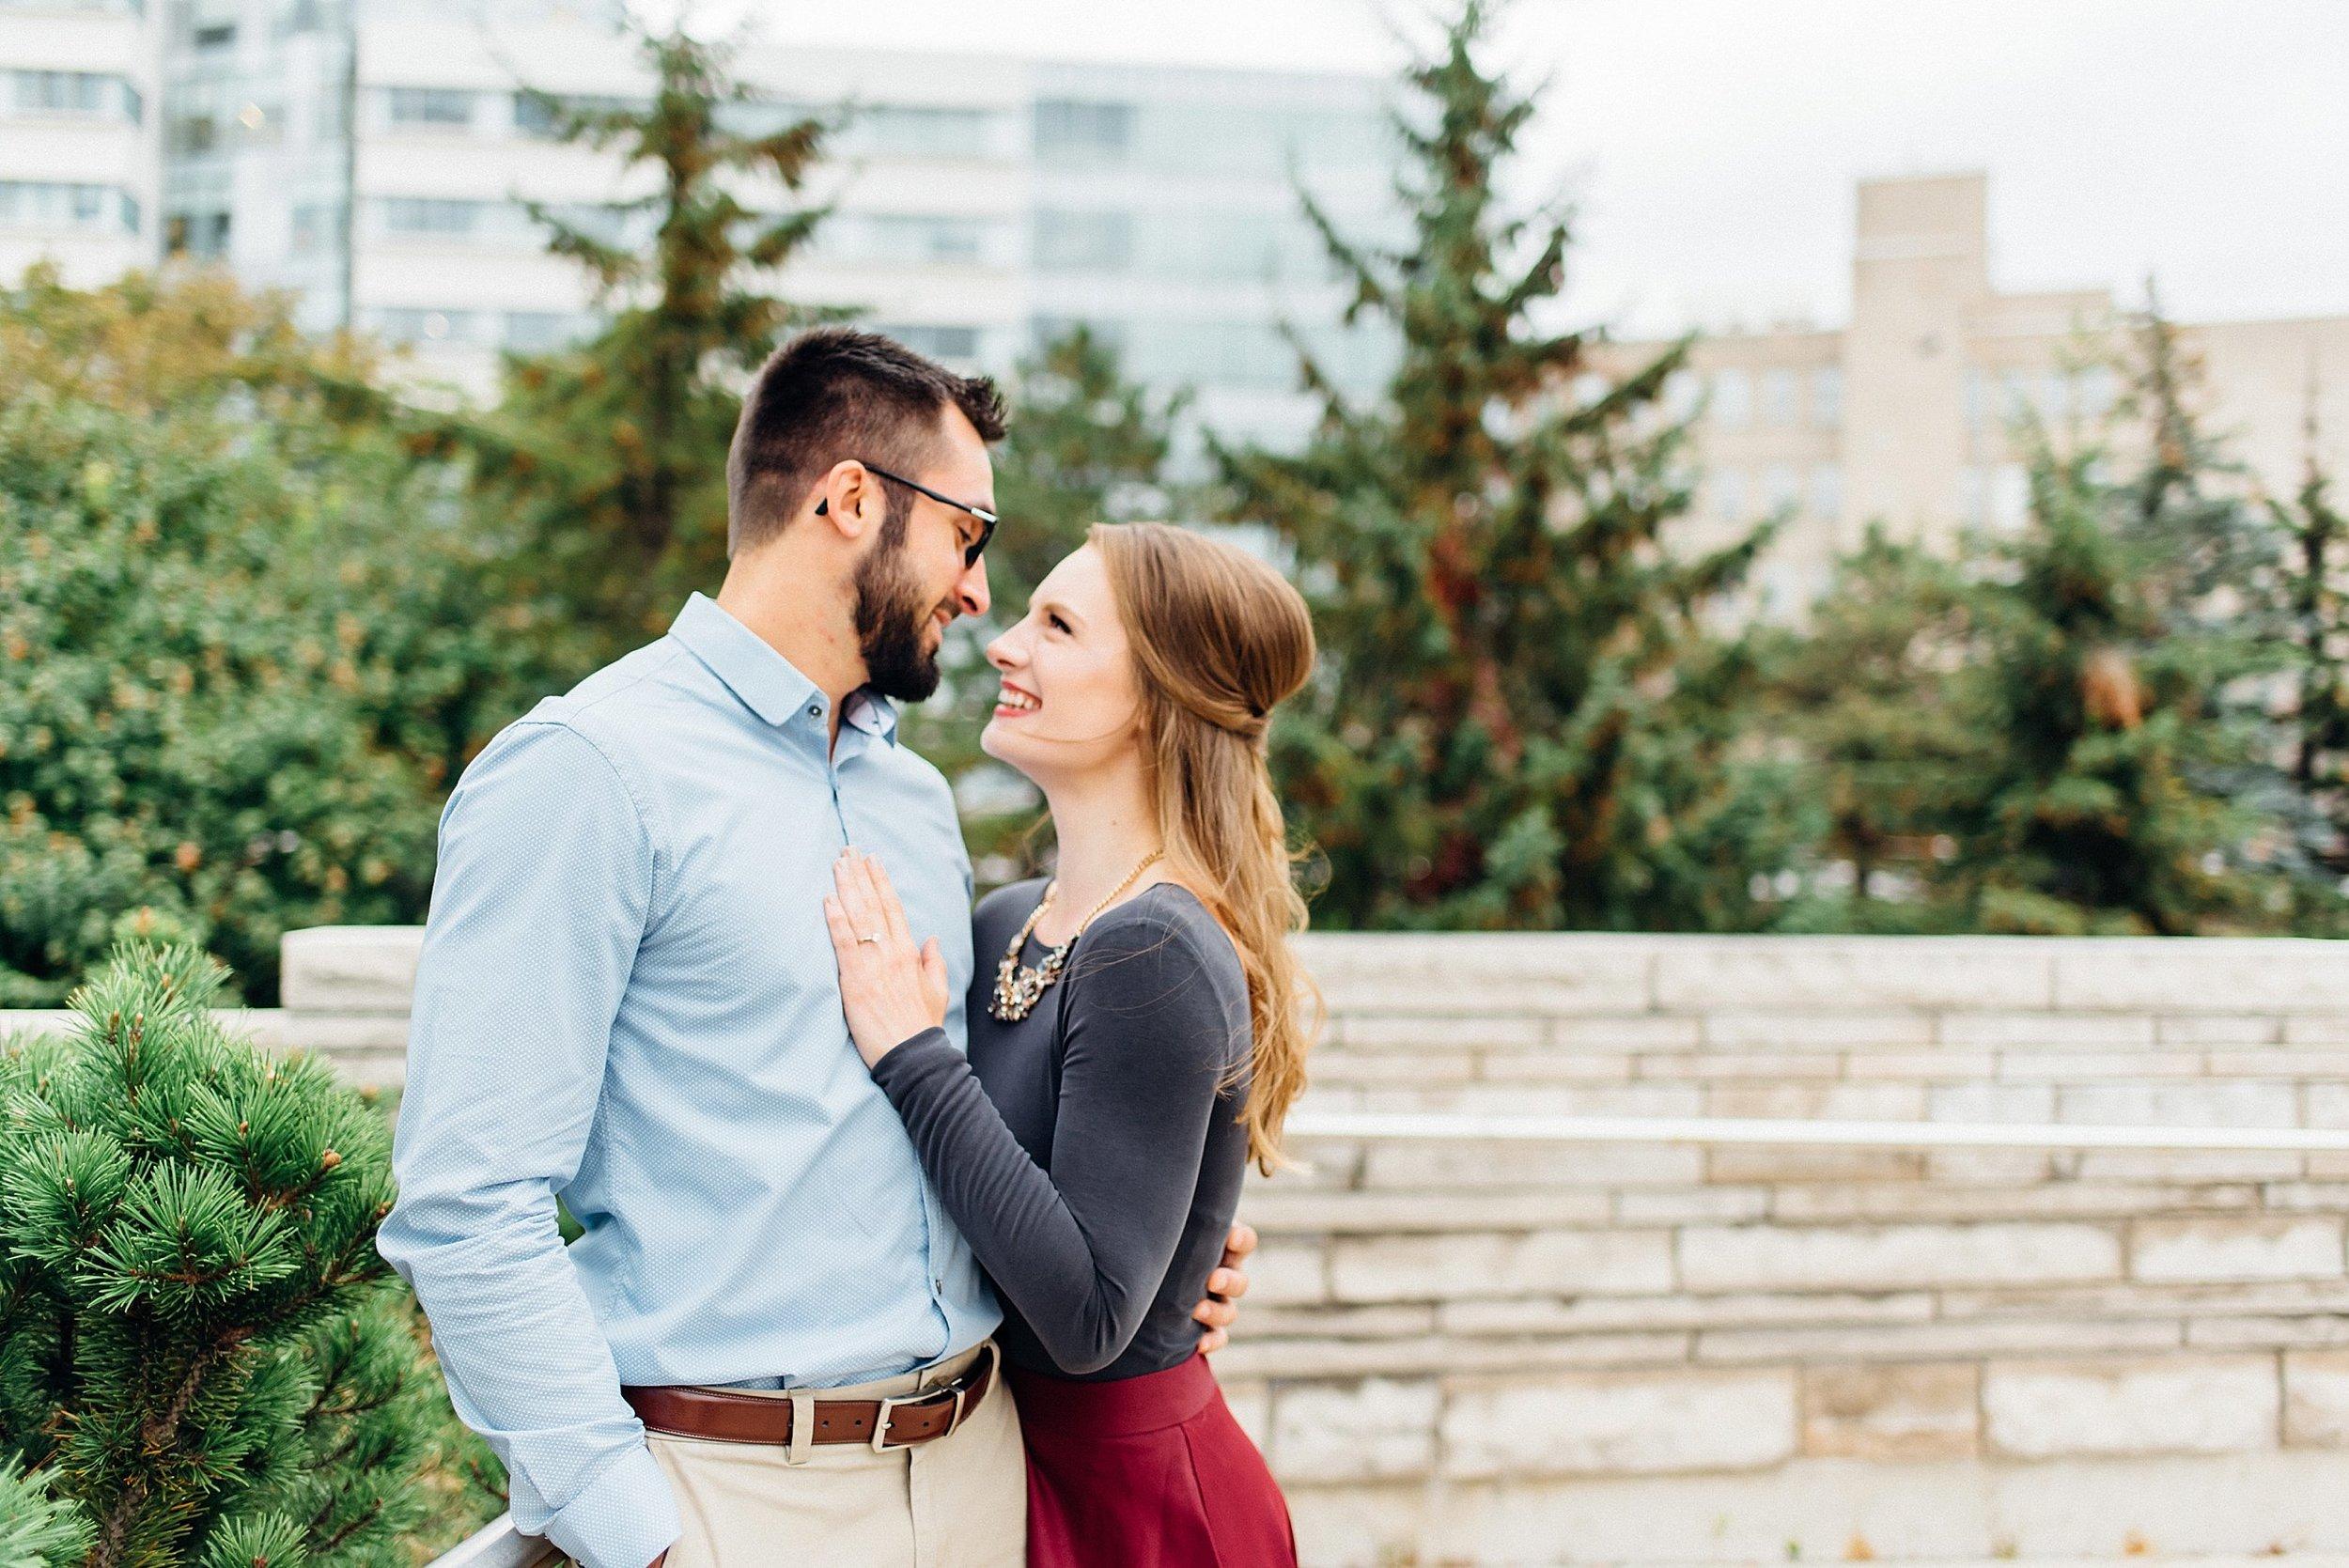 Ali and Batoul Photography - light, airy, indie documentary Ottawa wedding photographer_0125.jpg